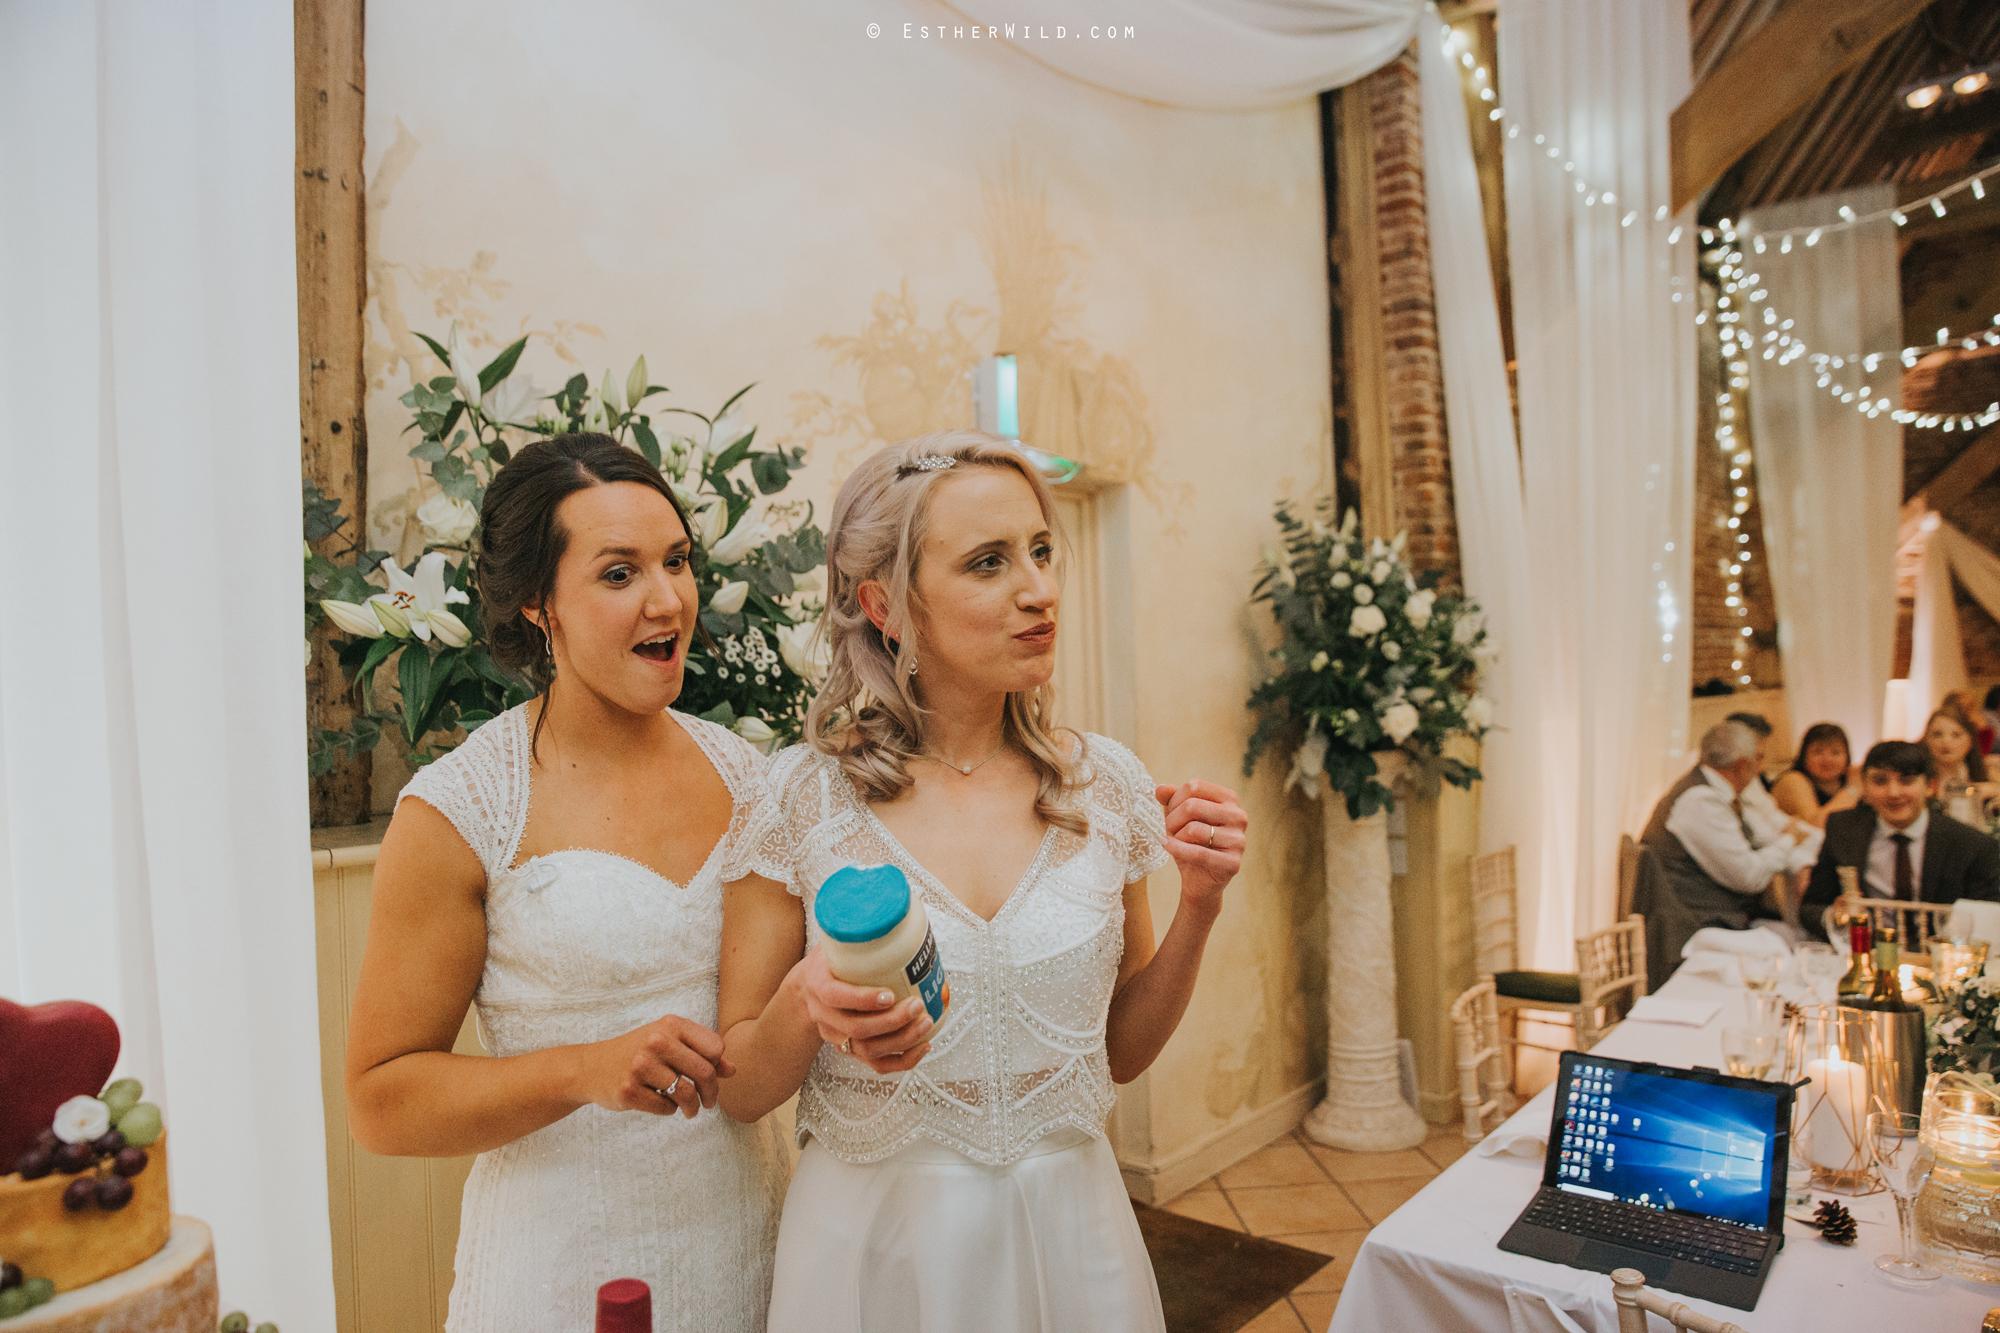 Elms_Barn_Weddings_Suffolk_Photographer_Copyright_Esther_Wild_IMG_2459.jpg